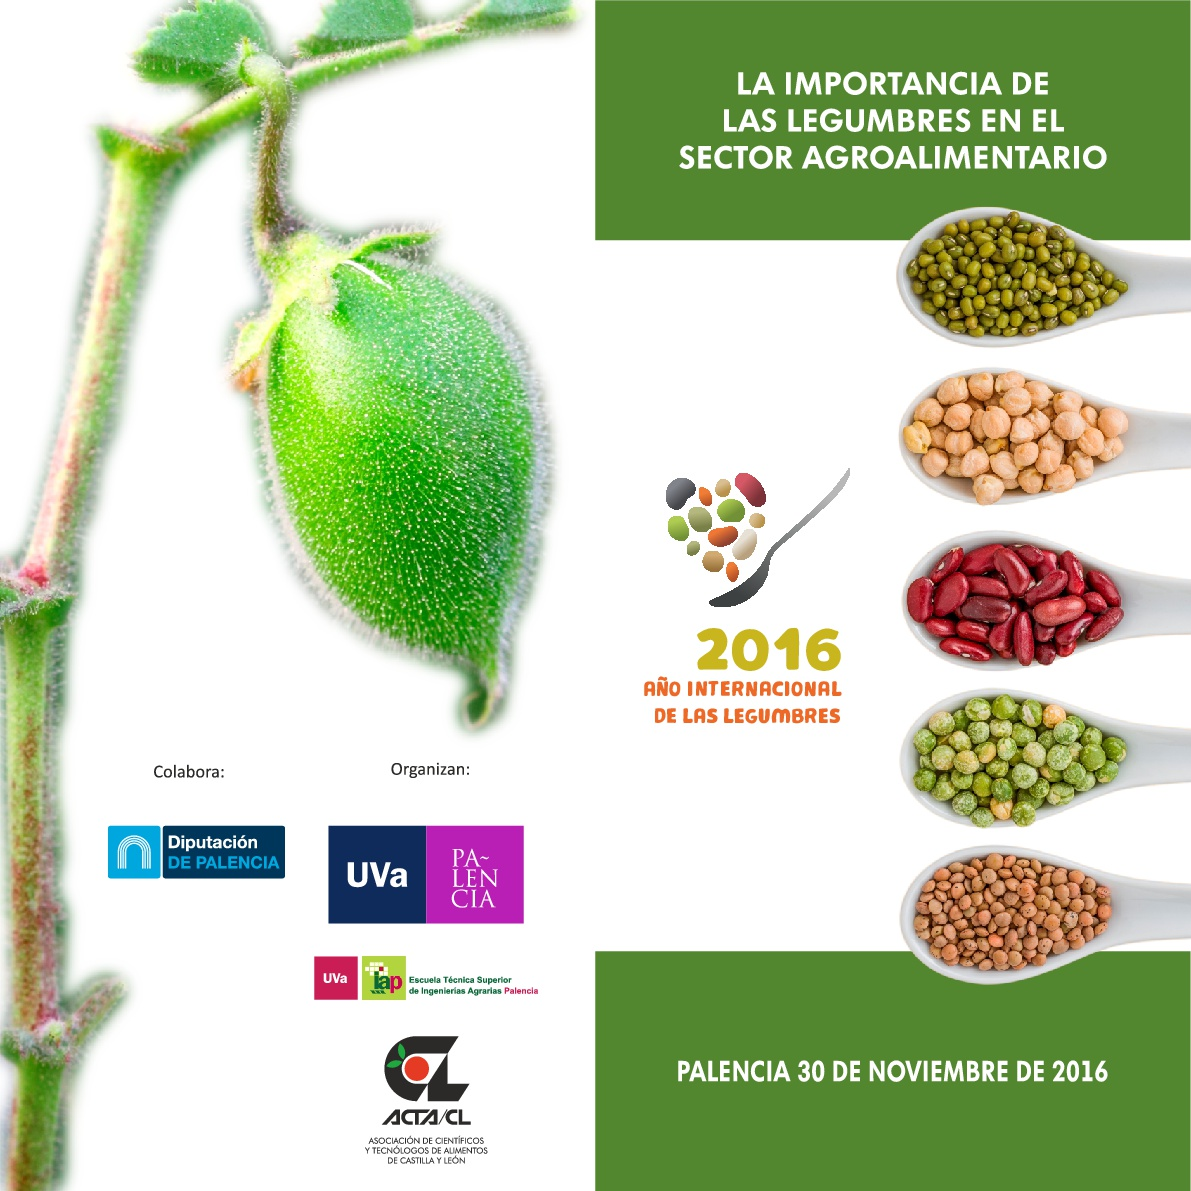 jornada-leguminosas-palencia-2016-001